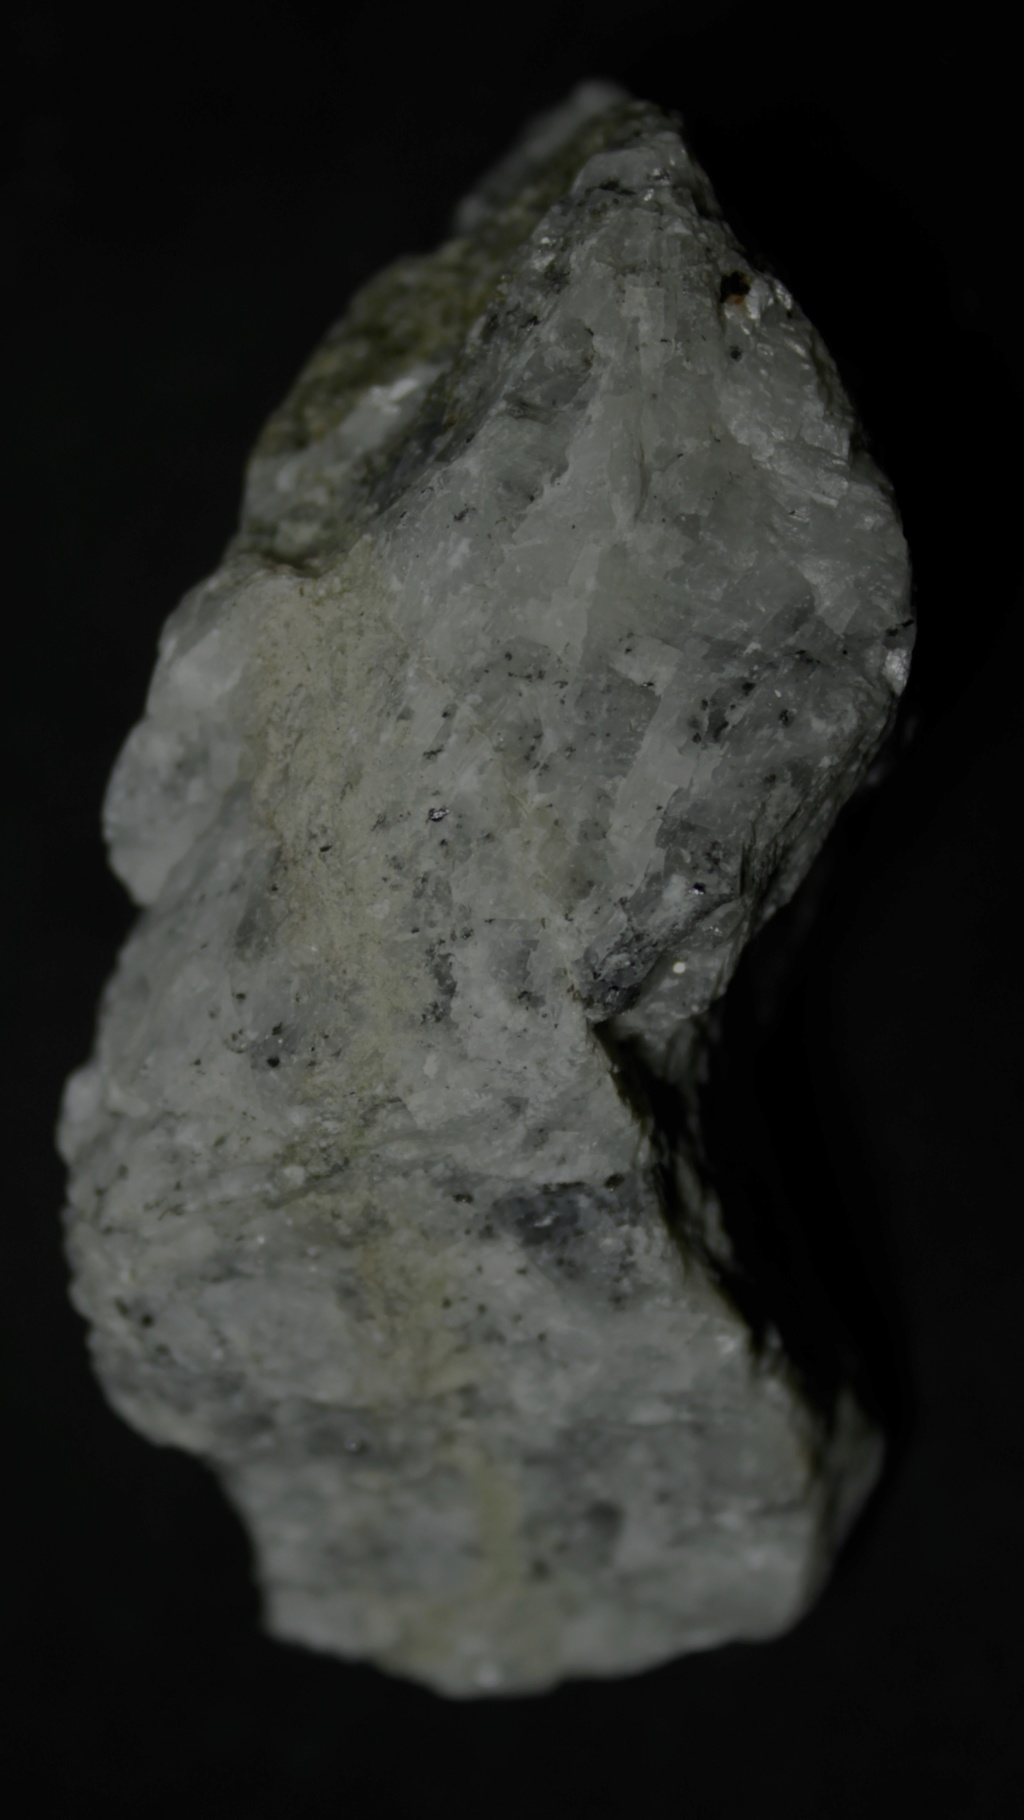 Colección de Minerales Fluorescentes - Página 6 Fullsi32